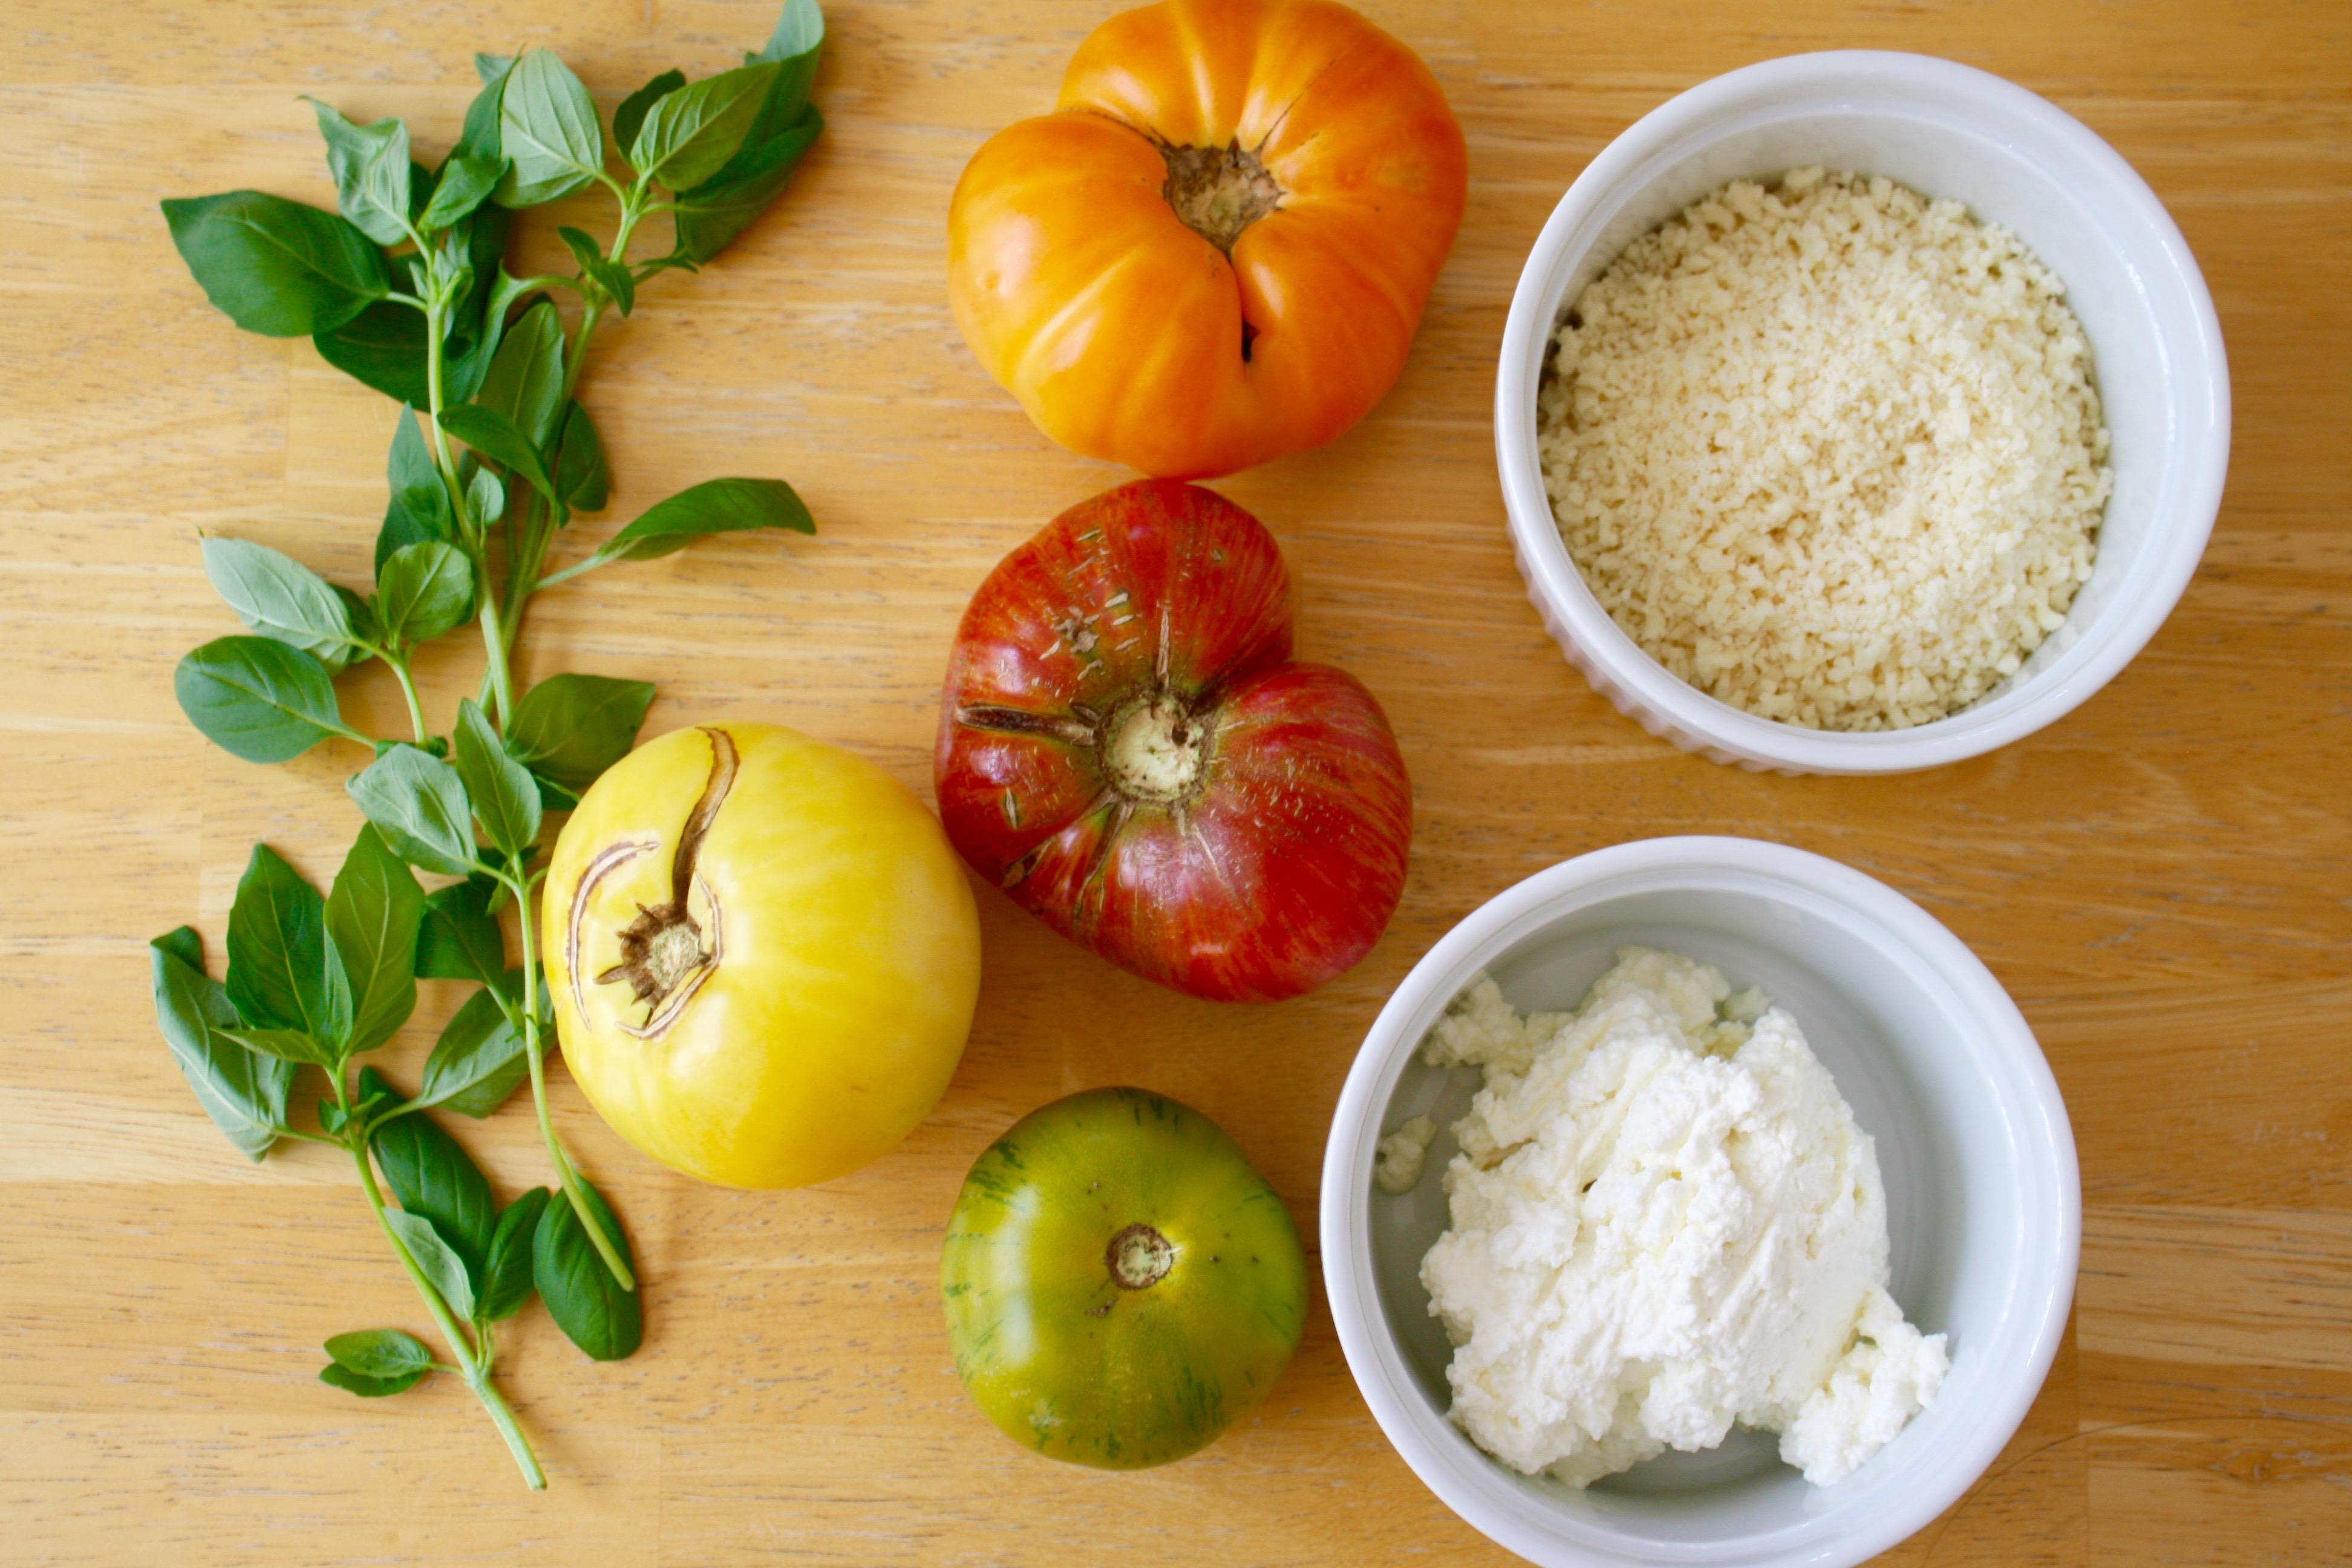 heirloom-tomato-tart-ingredients